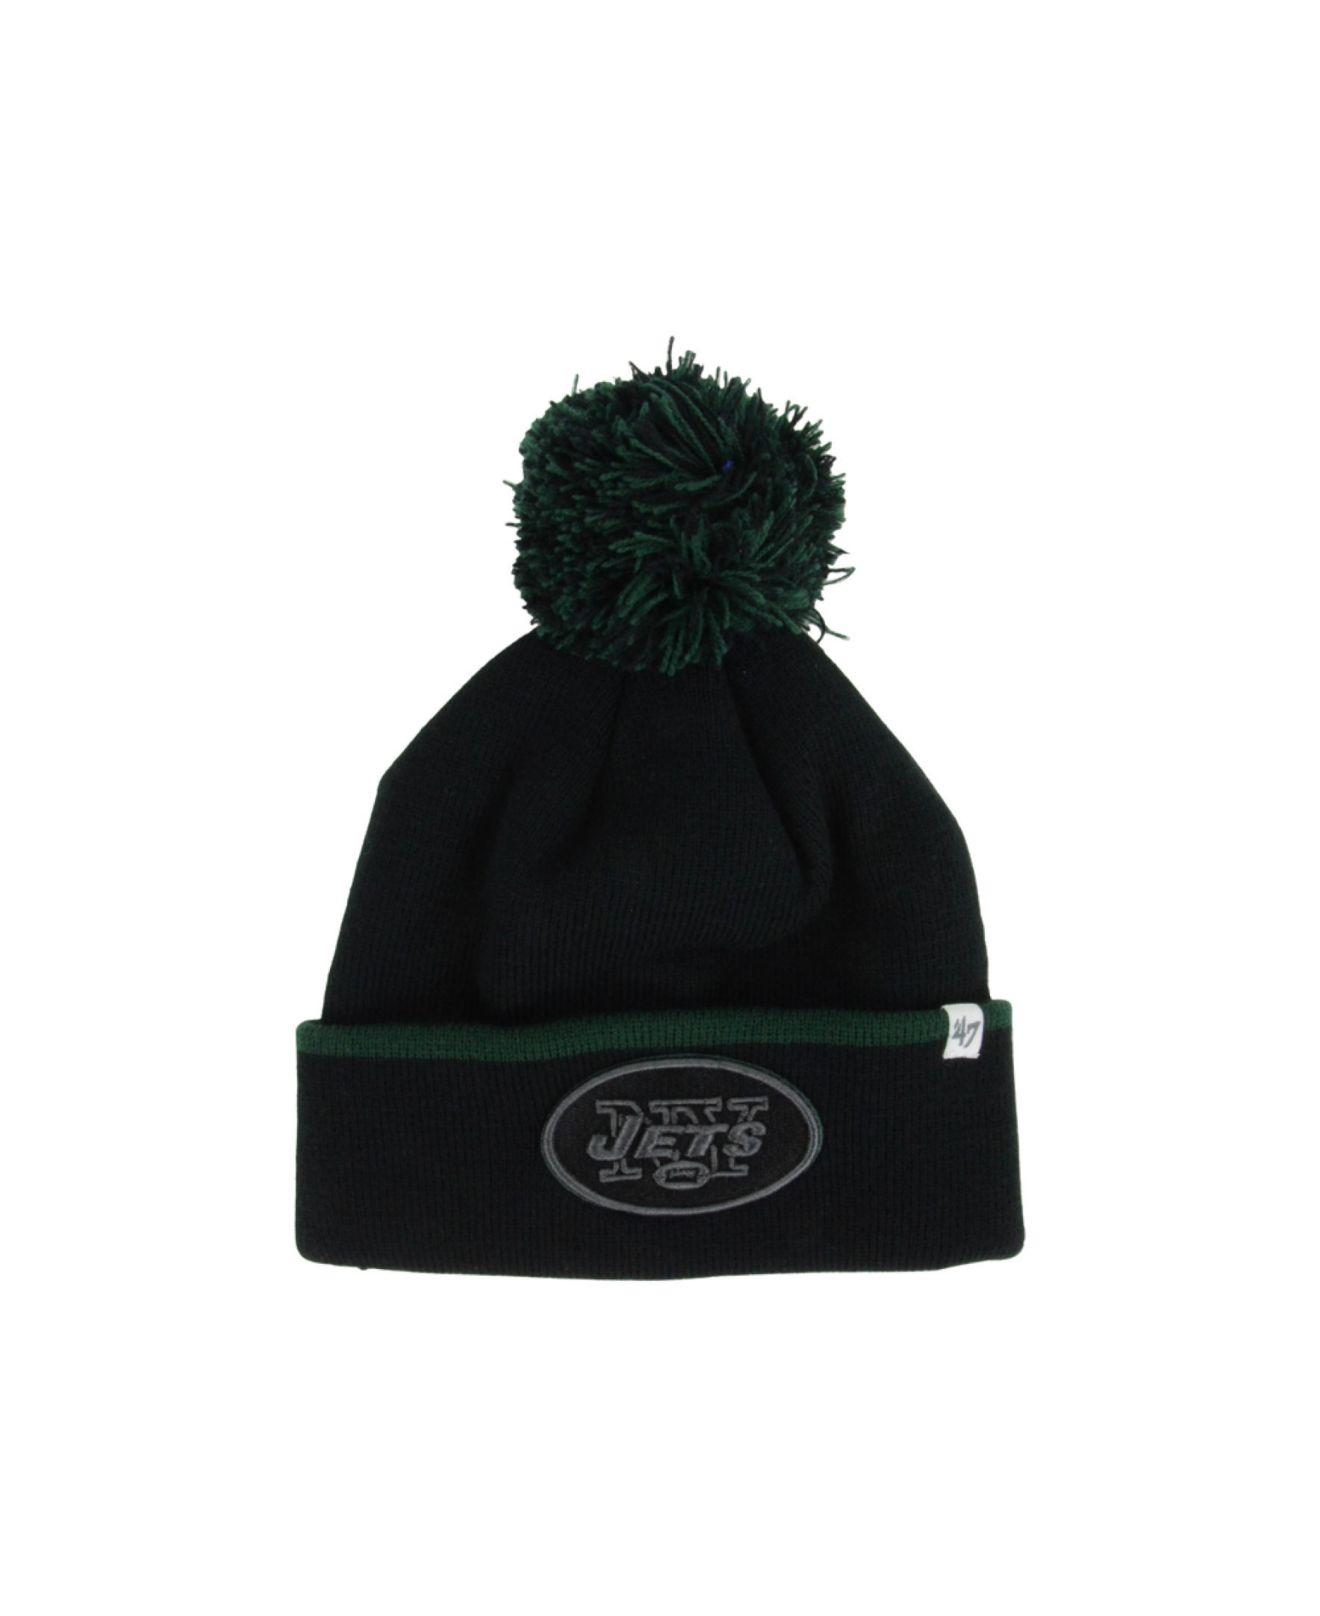 dd47ead737547 ... italy lyst 47 brand new york jets baraka knit hat in black for men  391cc 300f5